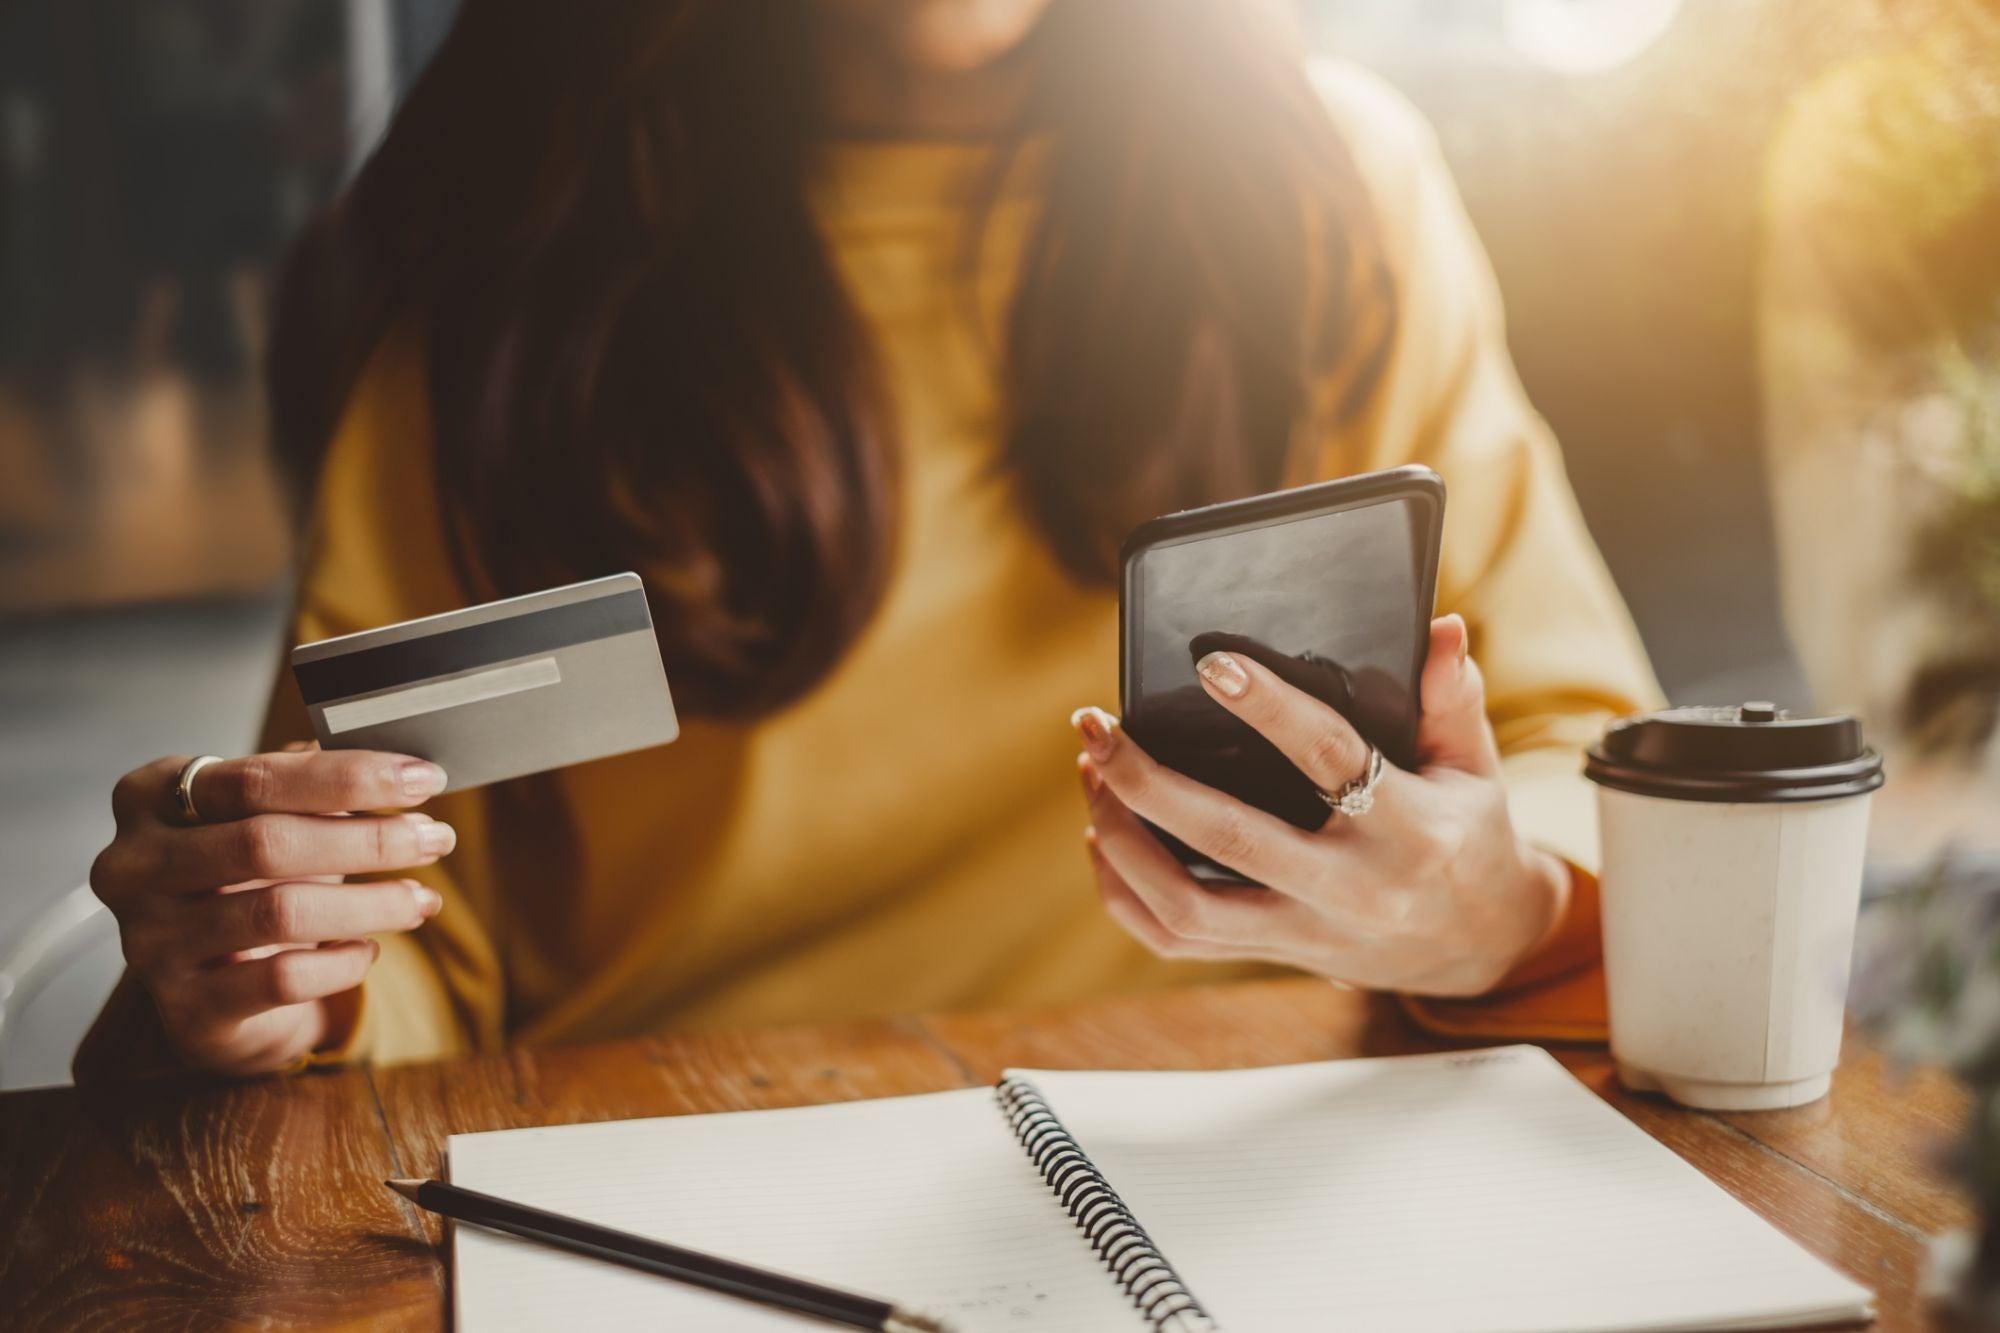 , 5 Can't-Miss E-Commerce Personalization Ideas, Saubio Making Wealth